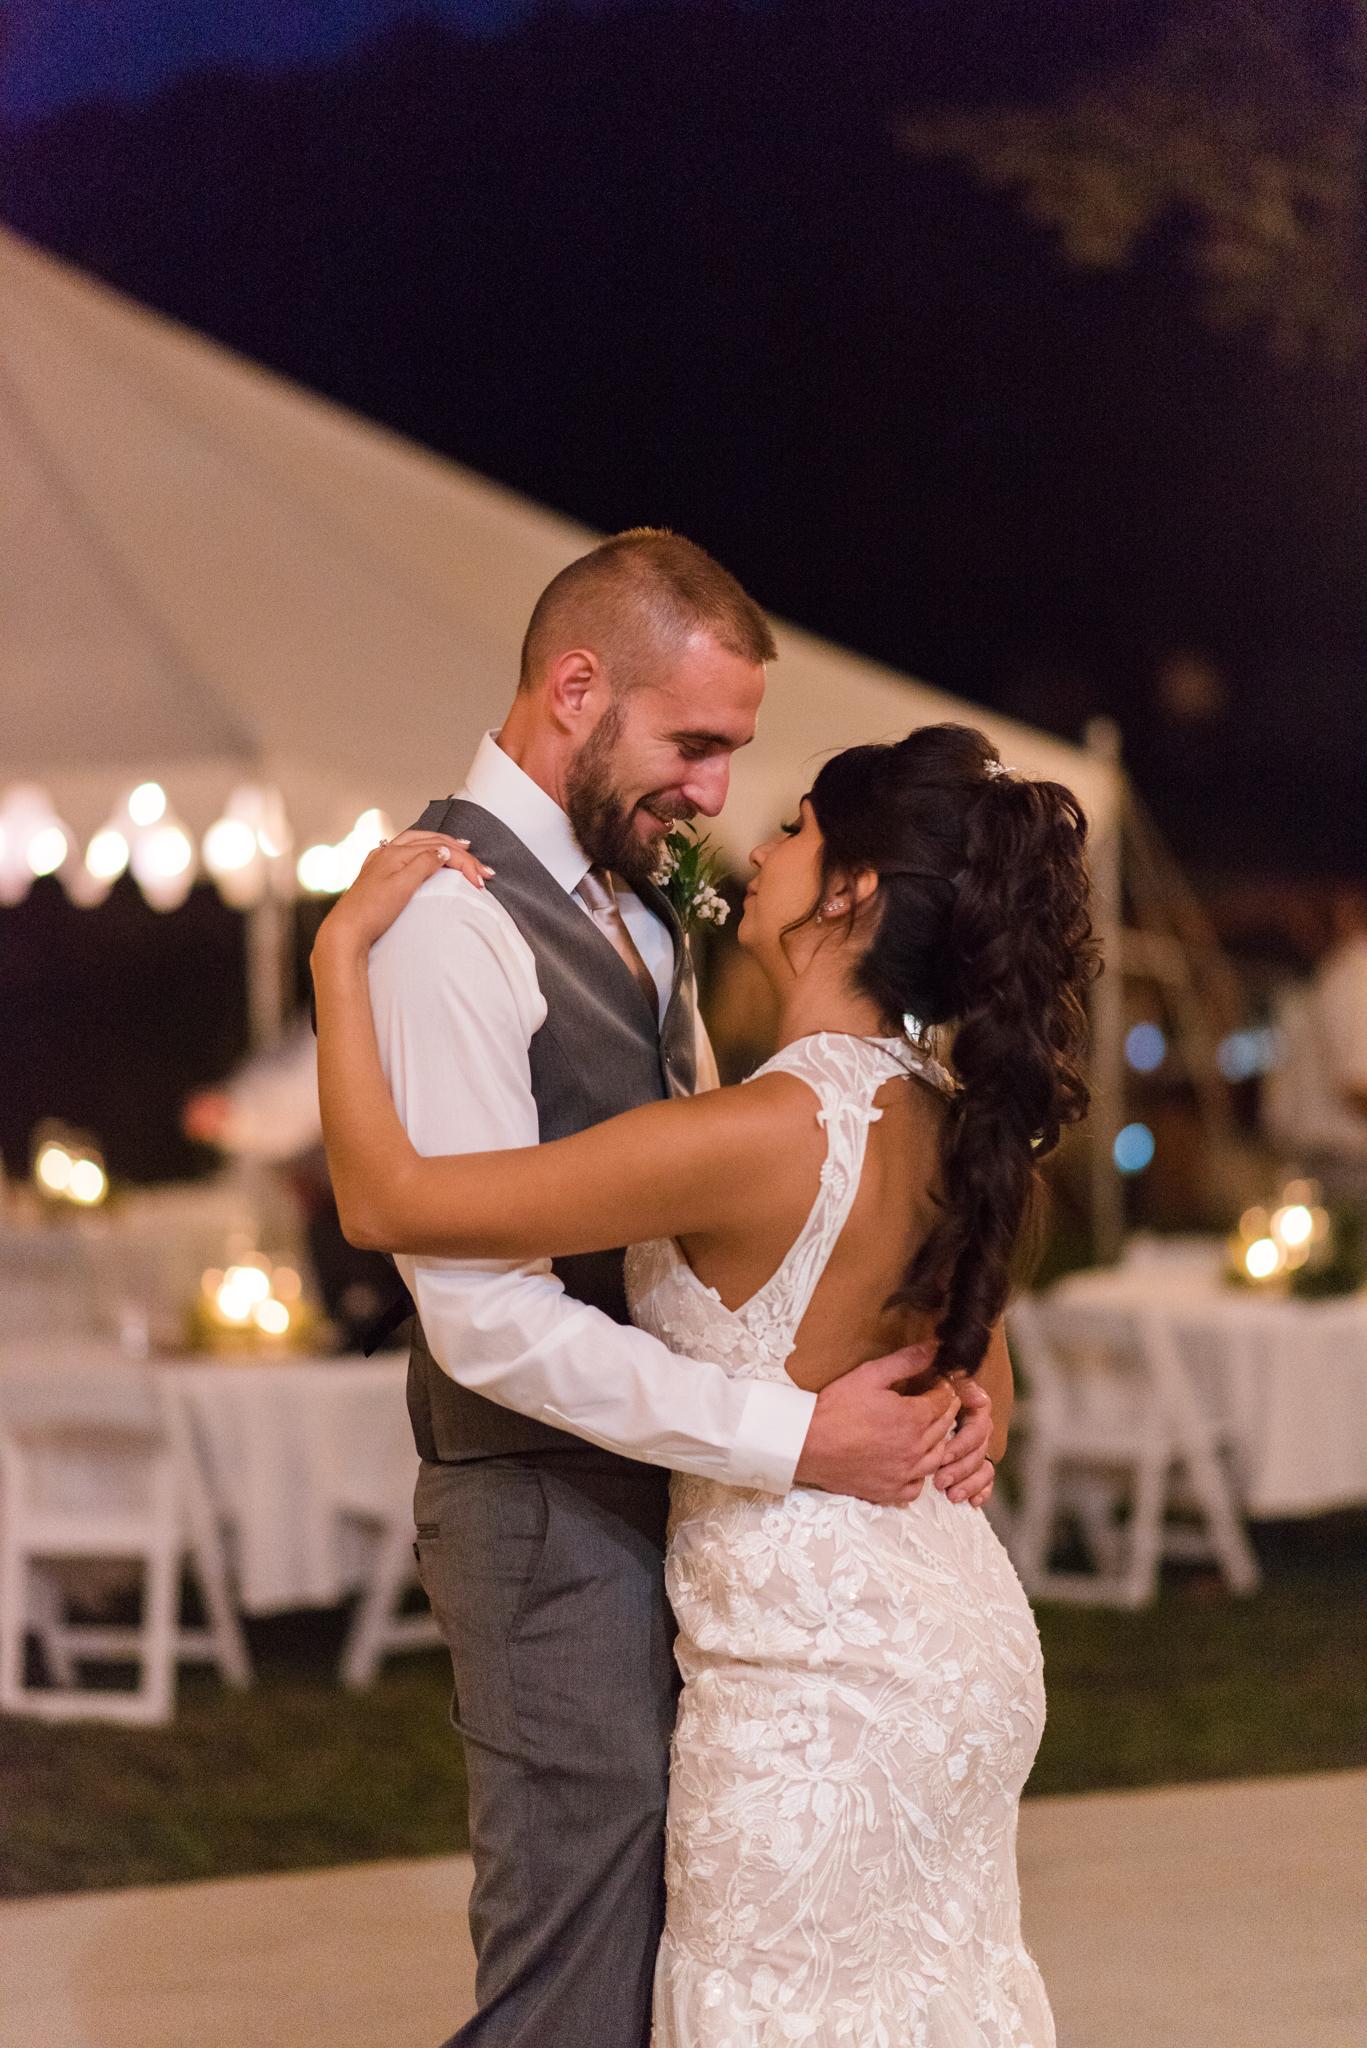 First Dance, KY wedding, KY wedding photographer, Kentucky bride, Red River Gorge